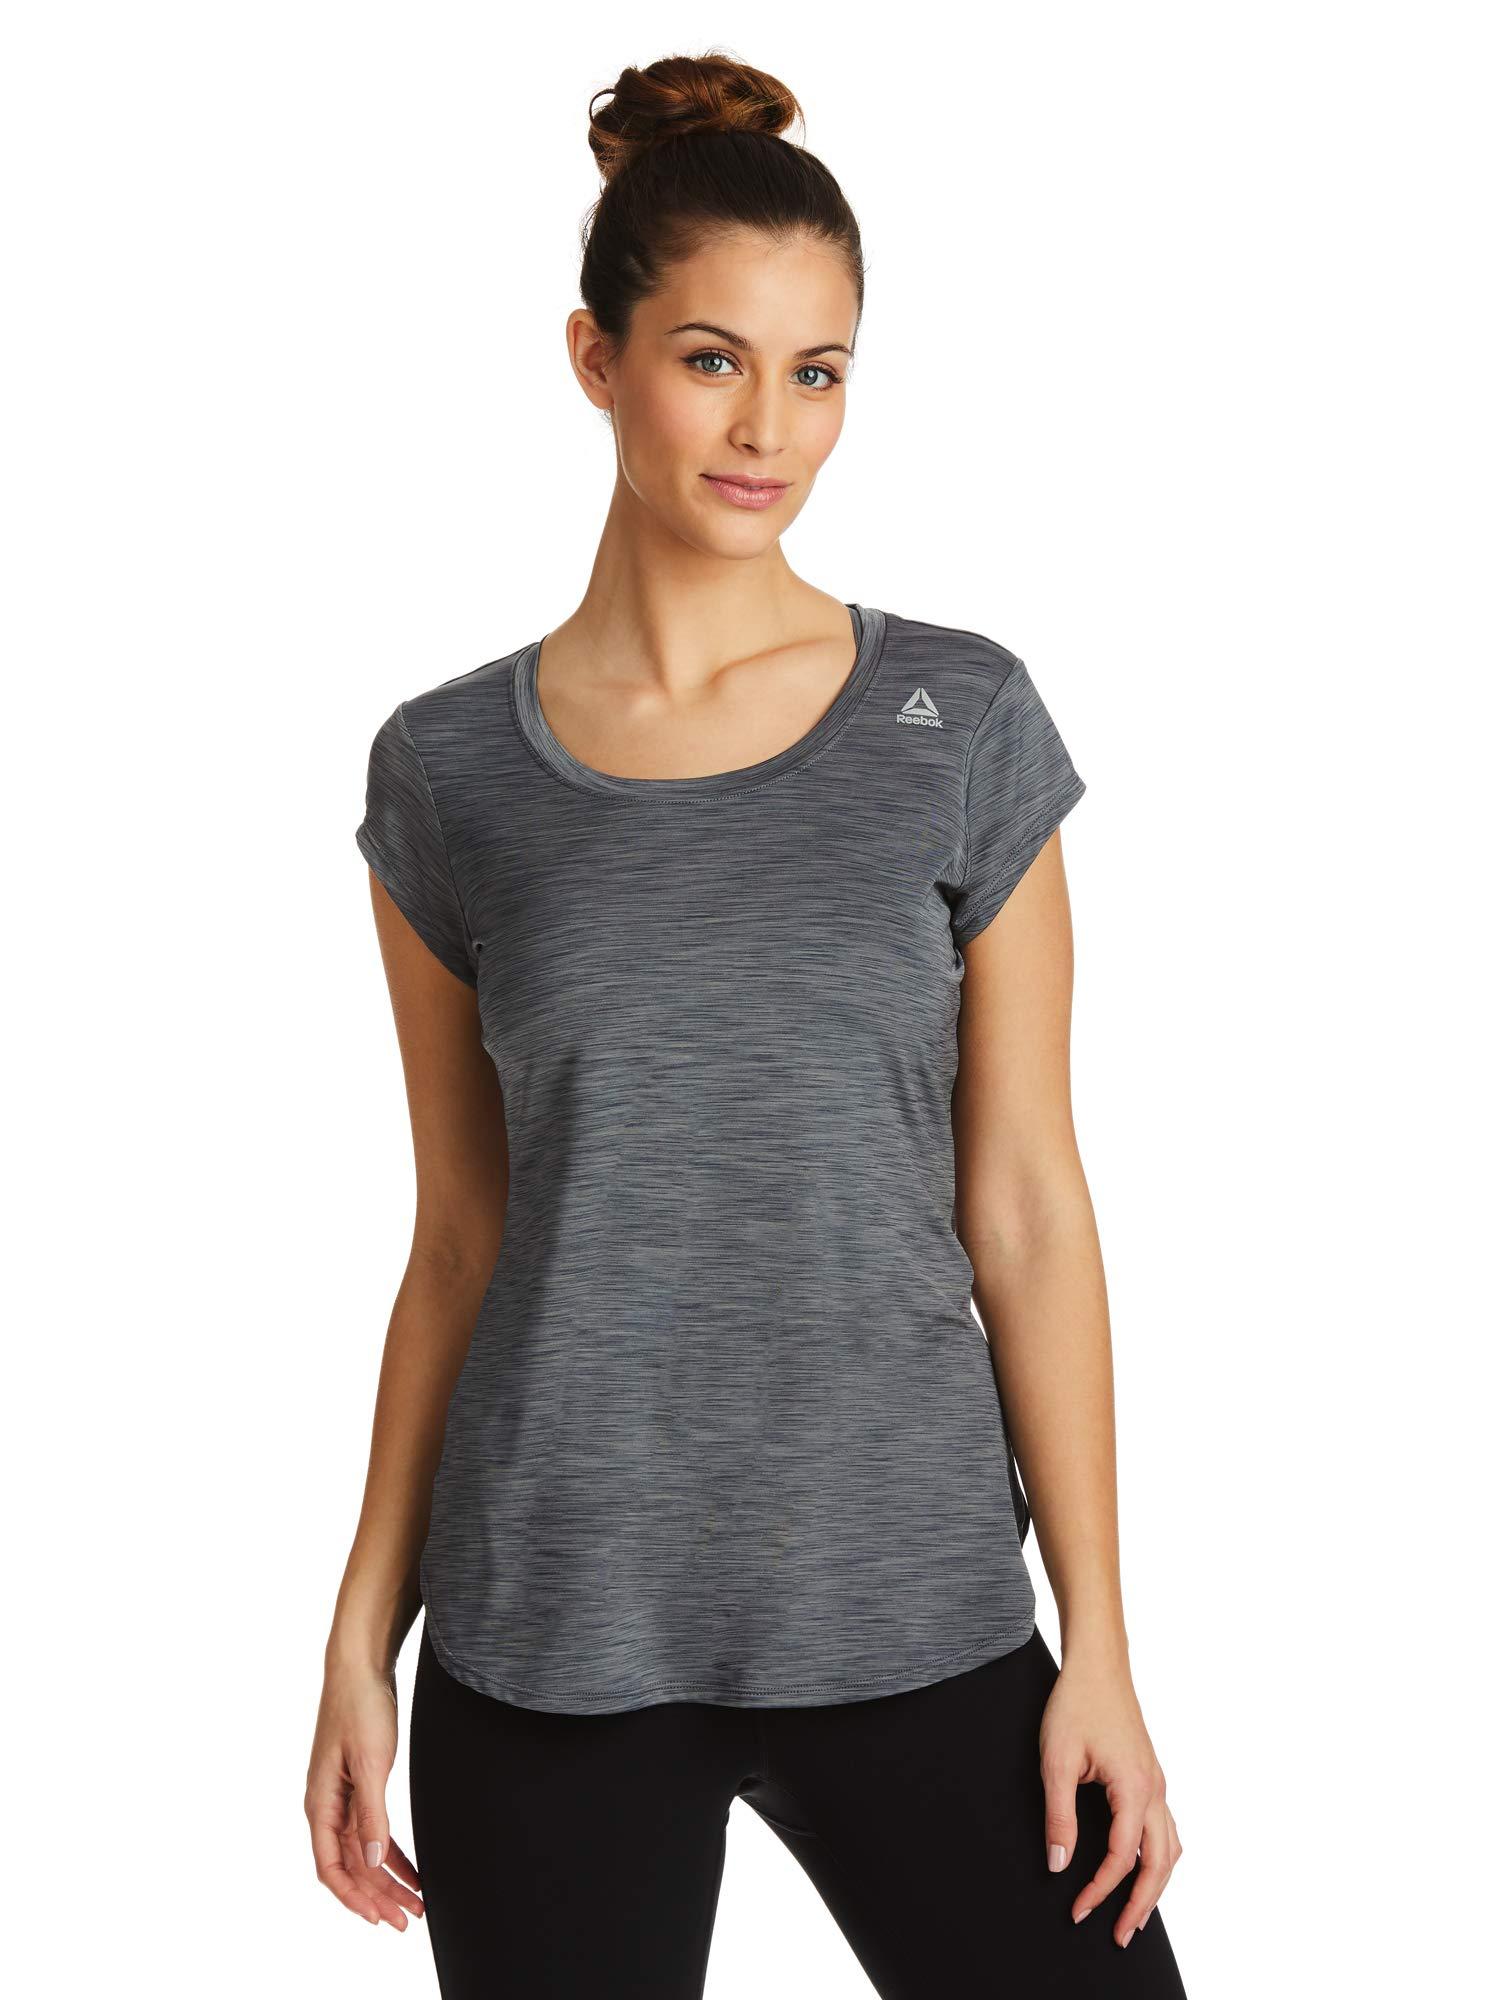 Reebok Women's Legend Performance Top Short Sleeve T-Shirt - Medium Grey Day, Large by Reebok